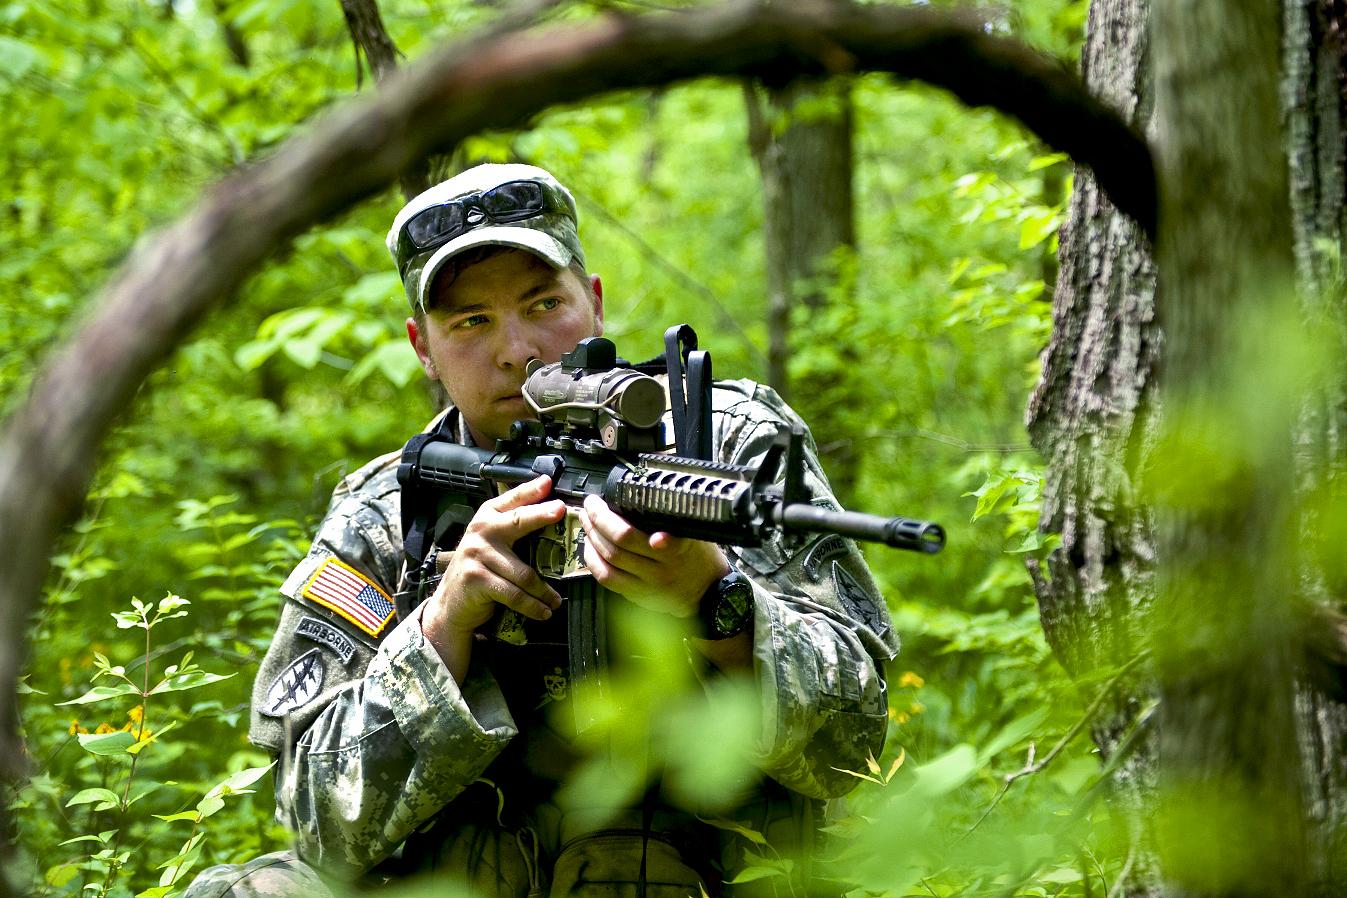 http://1.bp.blogspot.com/-o9tM_Gk93g0/TwbgVV--DdI/AAAAAAAAFes/pEEH6KV5U64/s1600/Soldier+Provides+Security.jpg